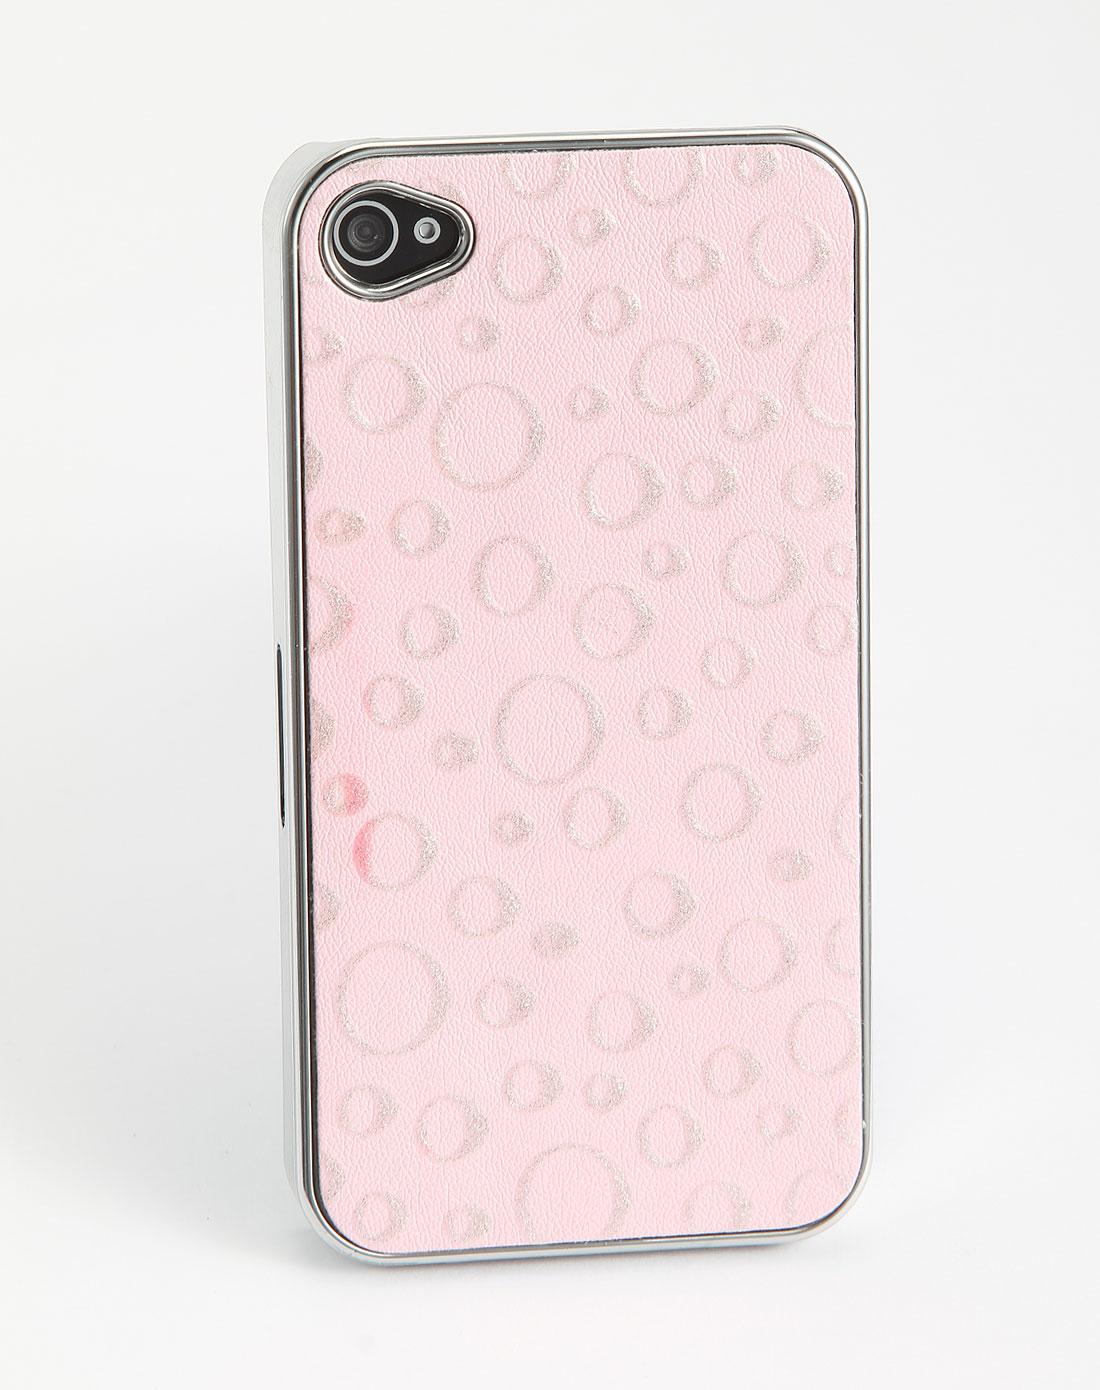 iphone4/4s粉红色梦幻彩圈手机壳